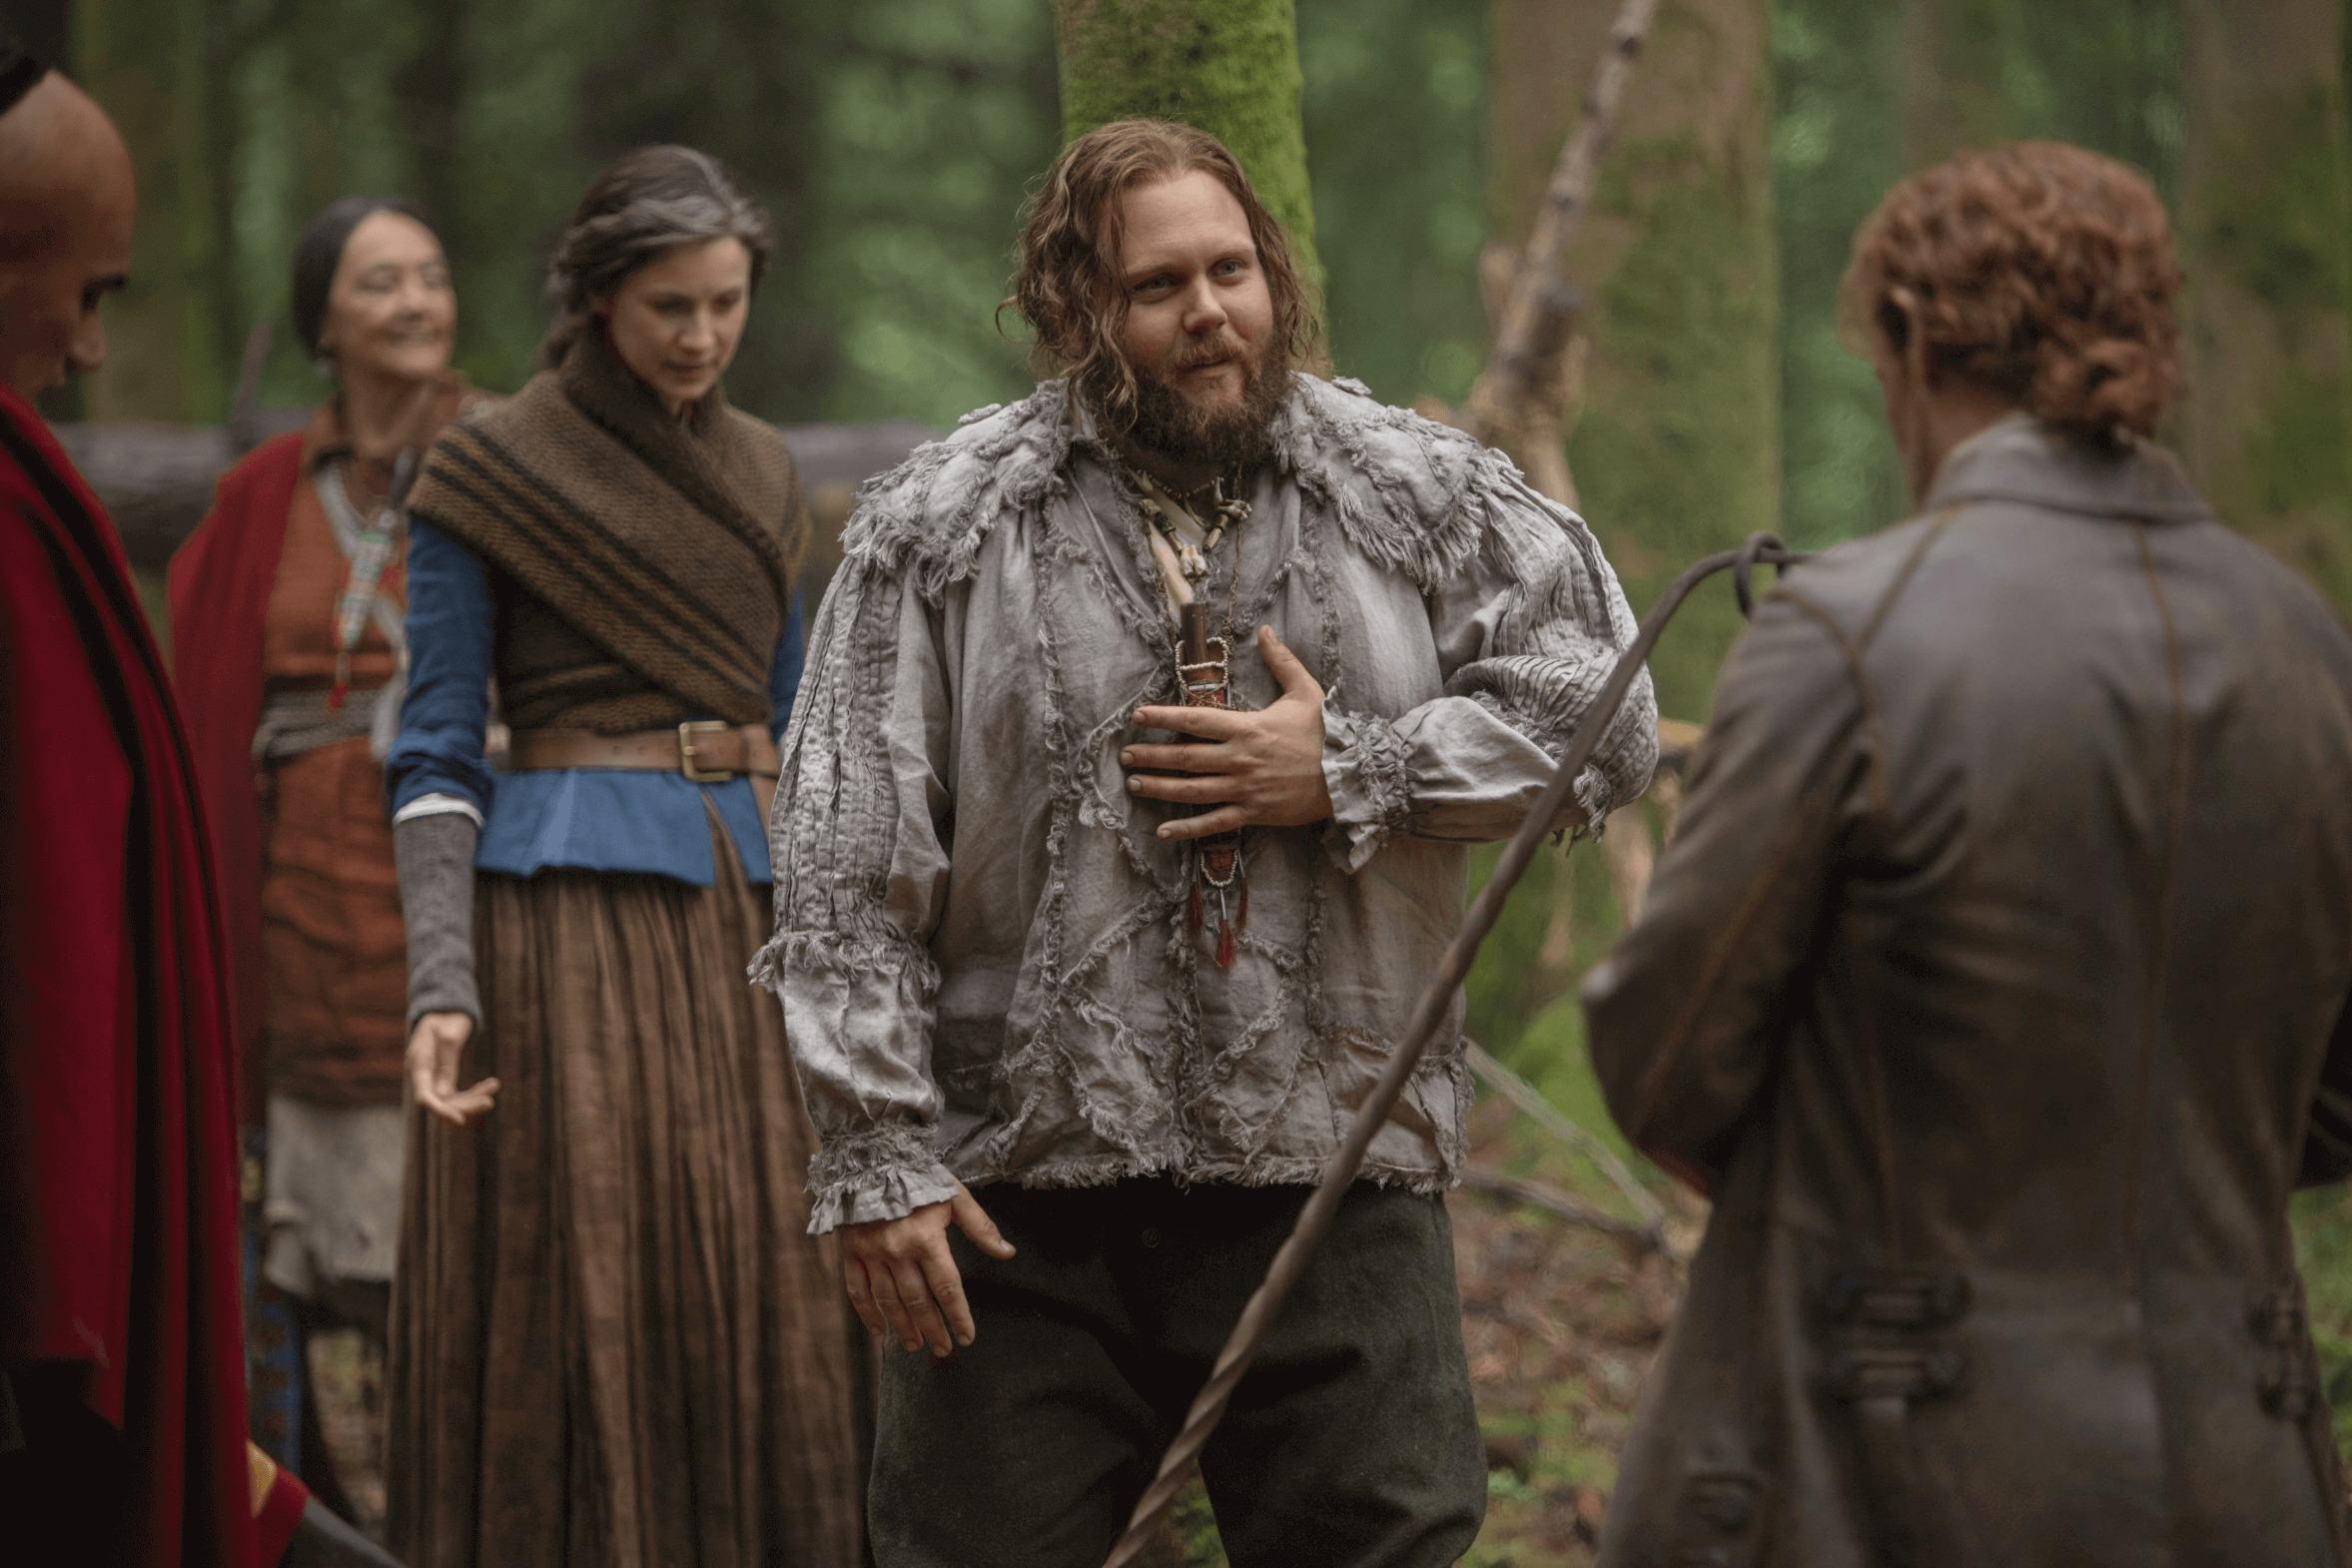 Preview: Outlander - Episode 4 - Common Ground - FANdemonium Network